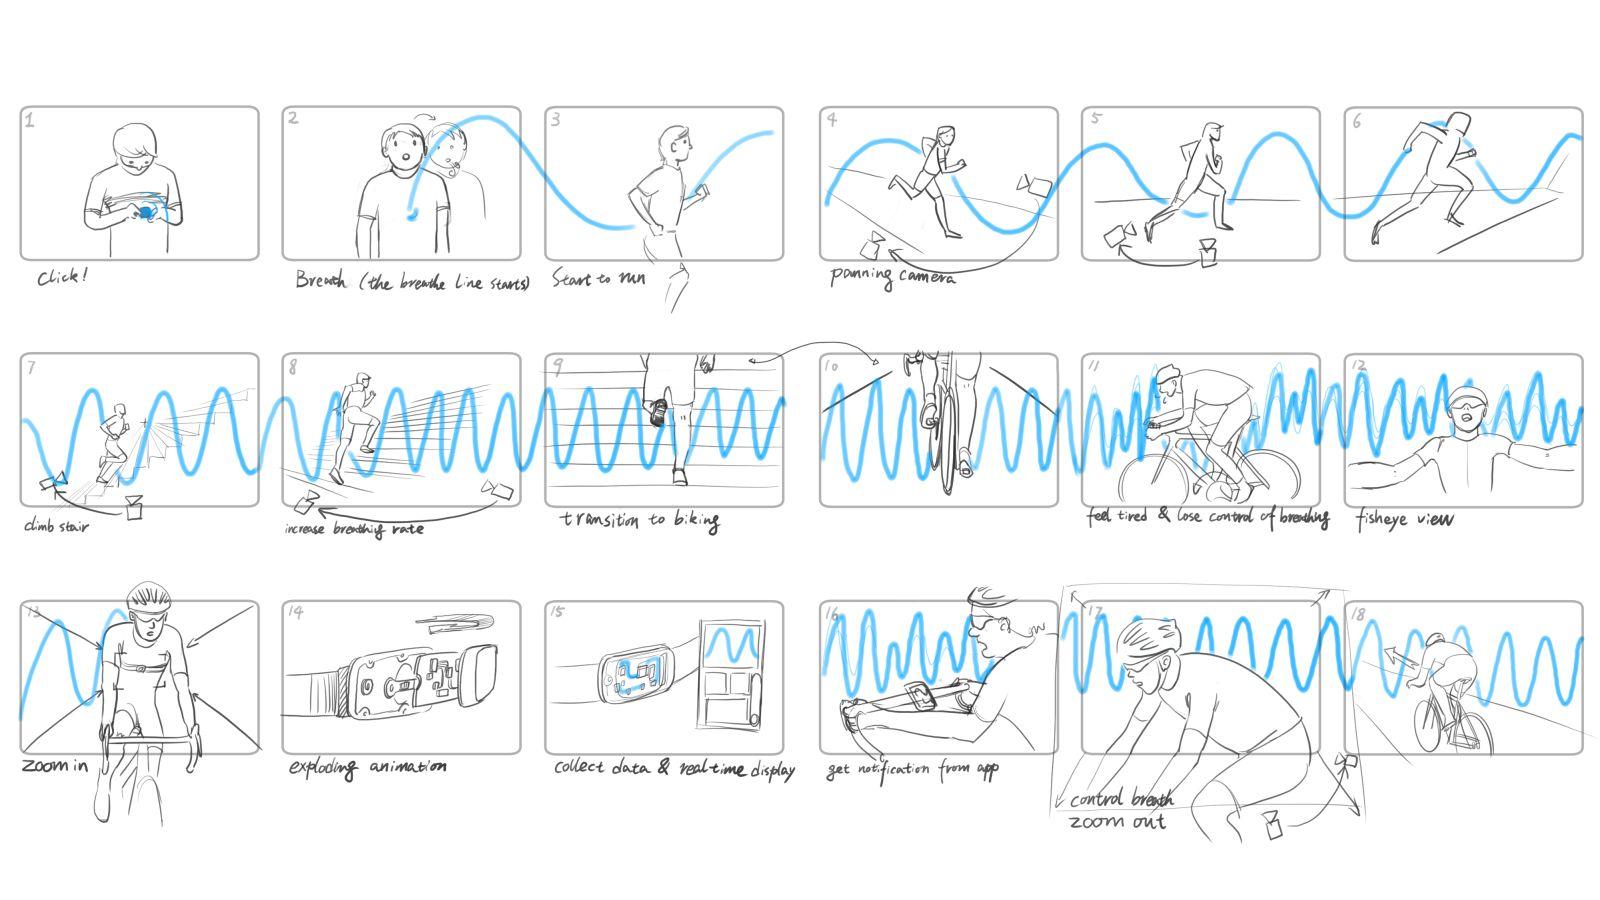 Storyboard-horizontal-900p.jpg